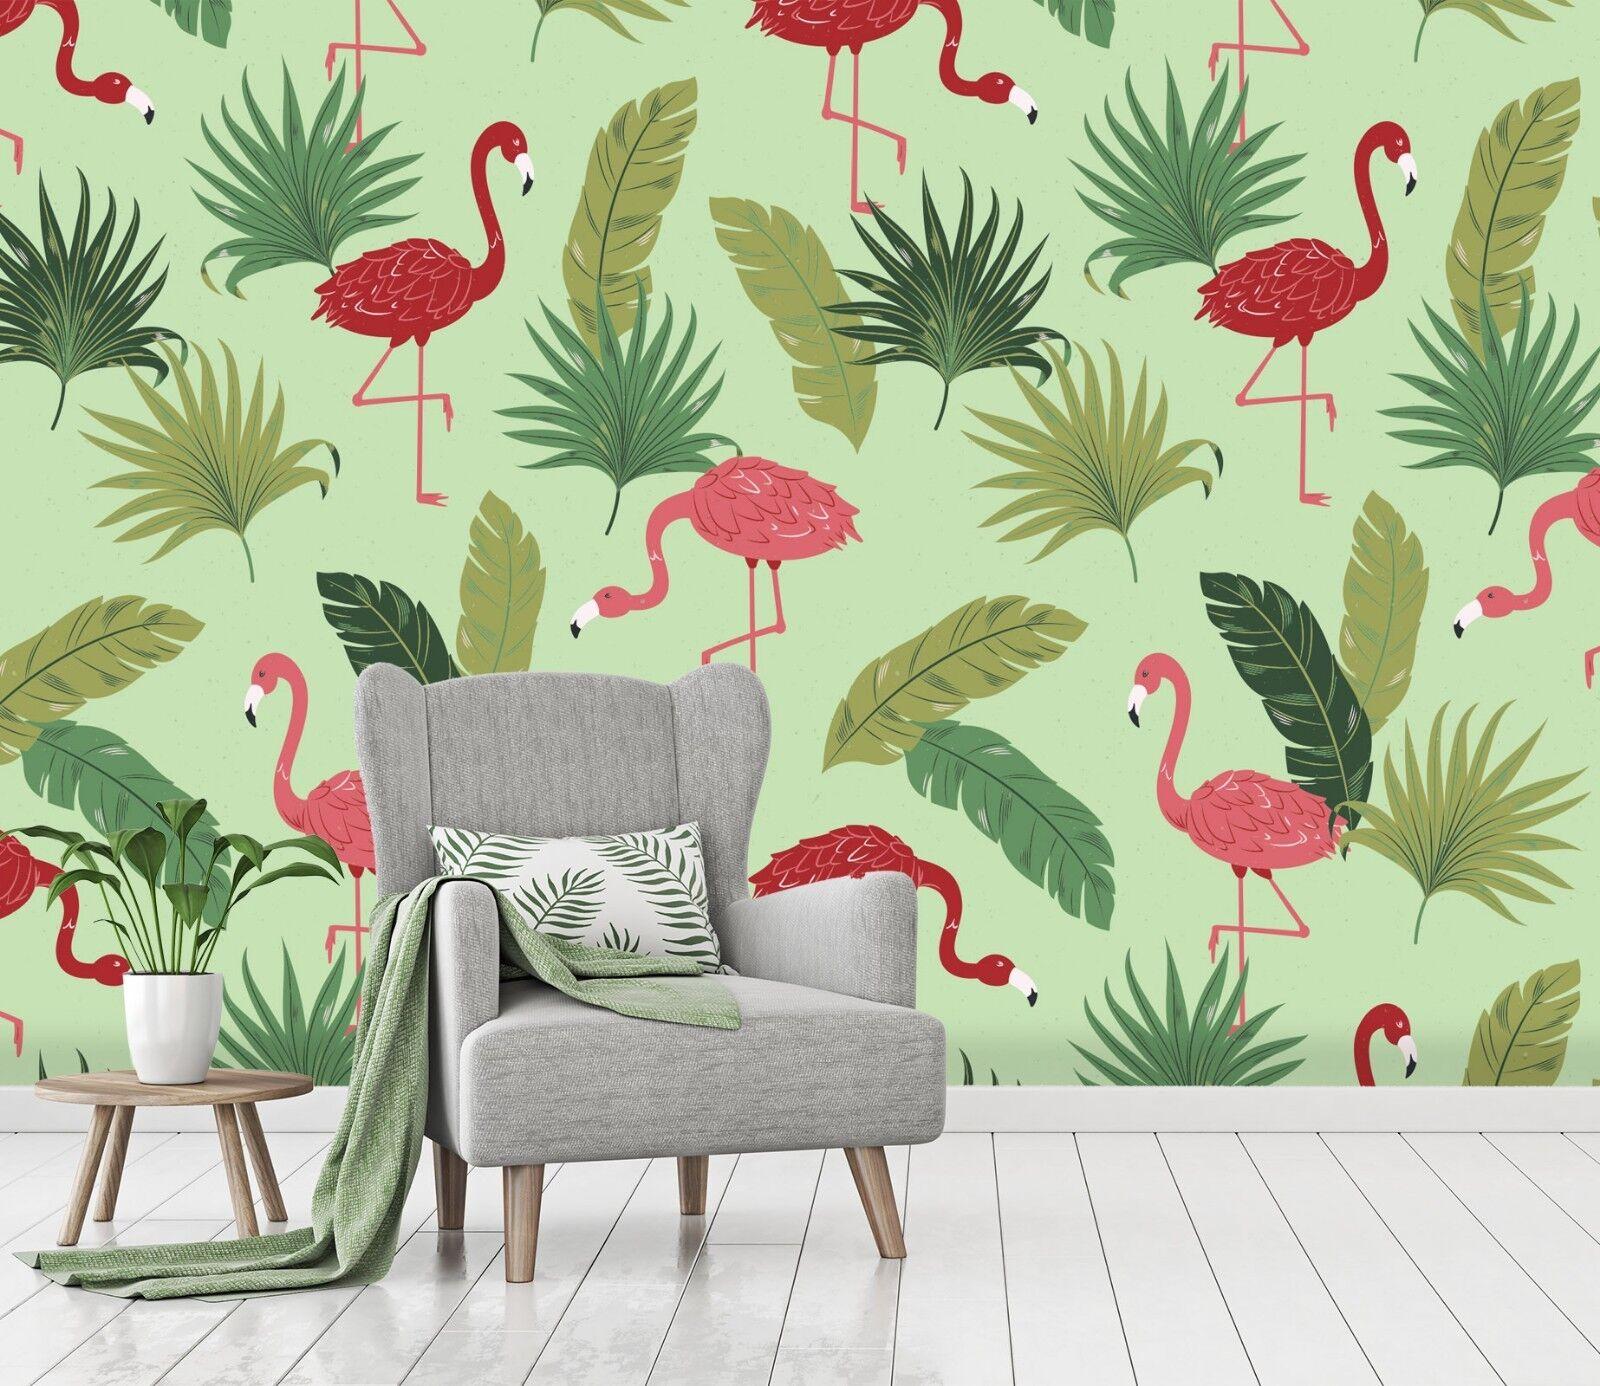 3D Tropische Pflanze Strauß 2 Tapete Wandgemälde Tapete Tapeten Familie Kinde DE